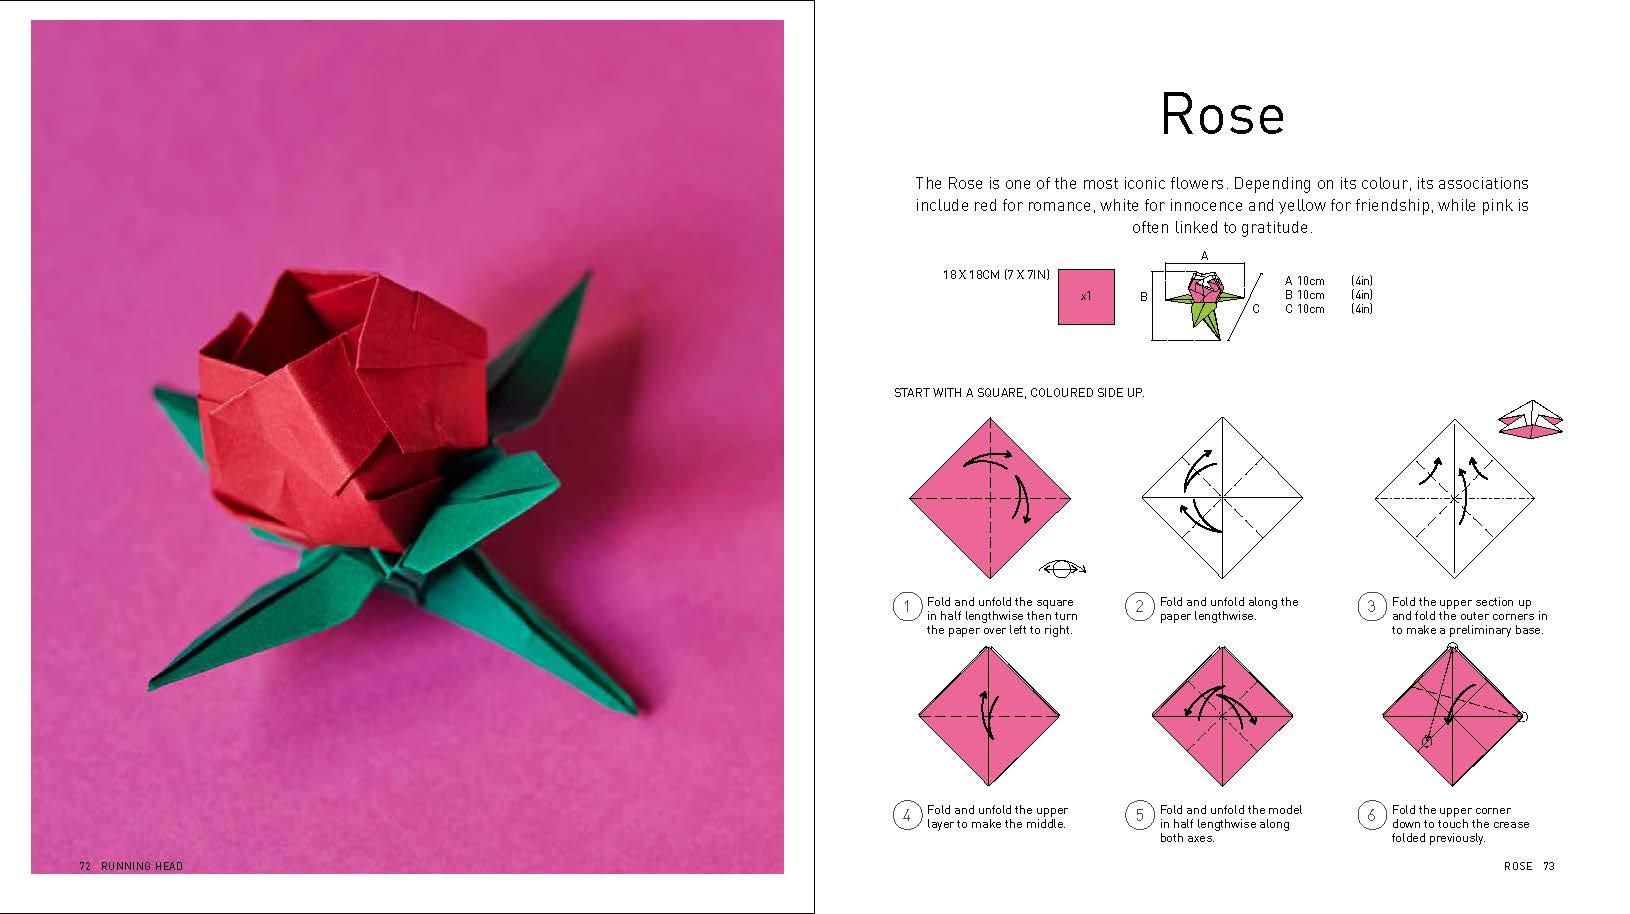 Perfectly mindful origami the origami garden mark bolitho brent perfectly mindful origami the origami garden mark bolitho brent darby 9781911127109 amazon books izmirmasajfo